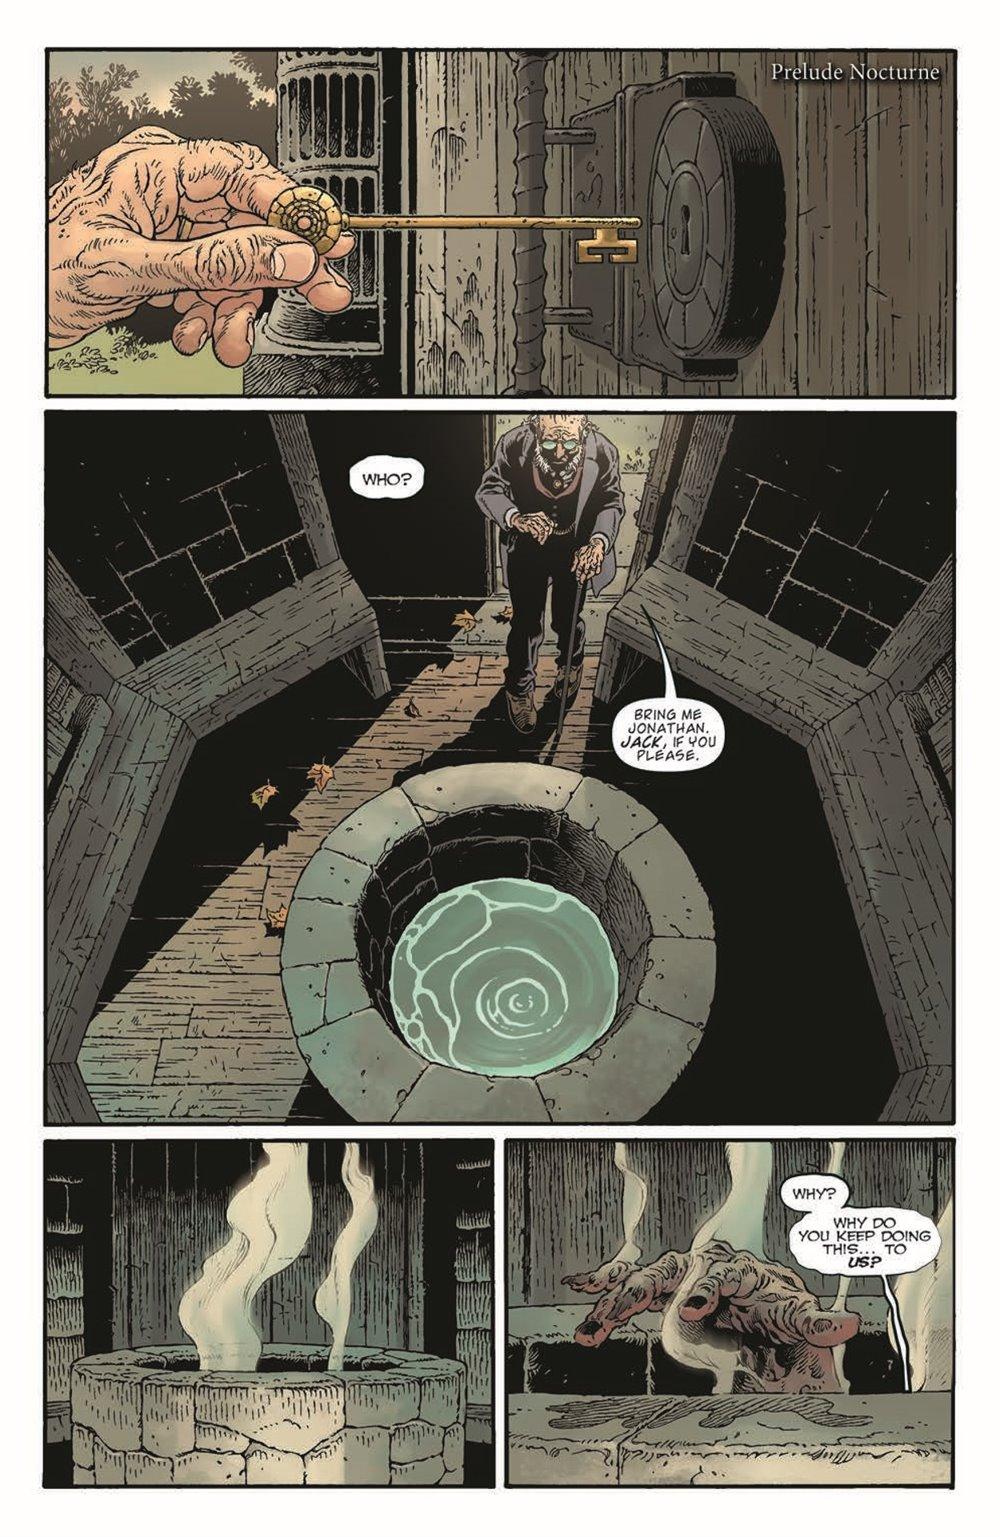 LnK-Sandman01_pr-3 ComicList Previews: LOCKE AND KEY THE SANDMAN UNIVERSE HELL AND GONE #1